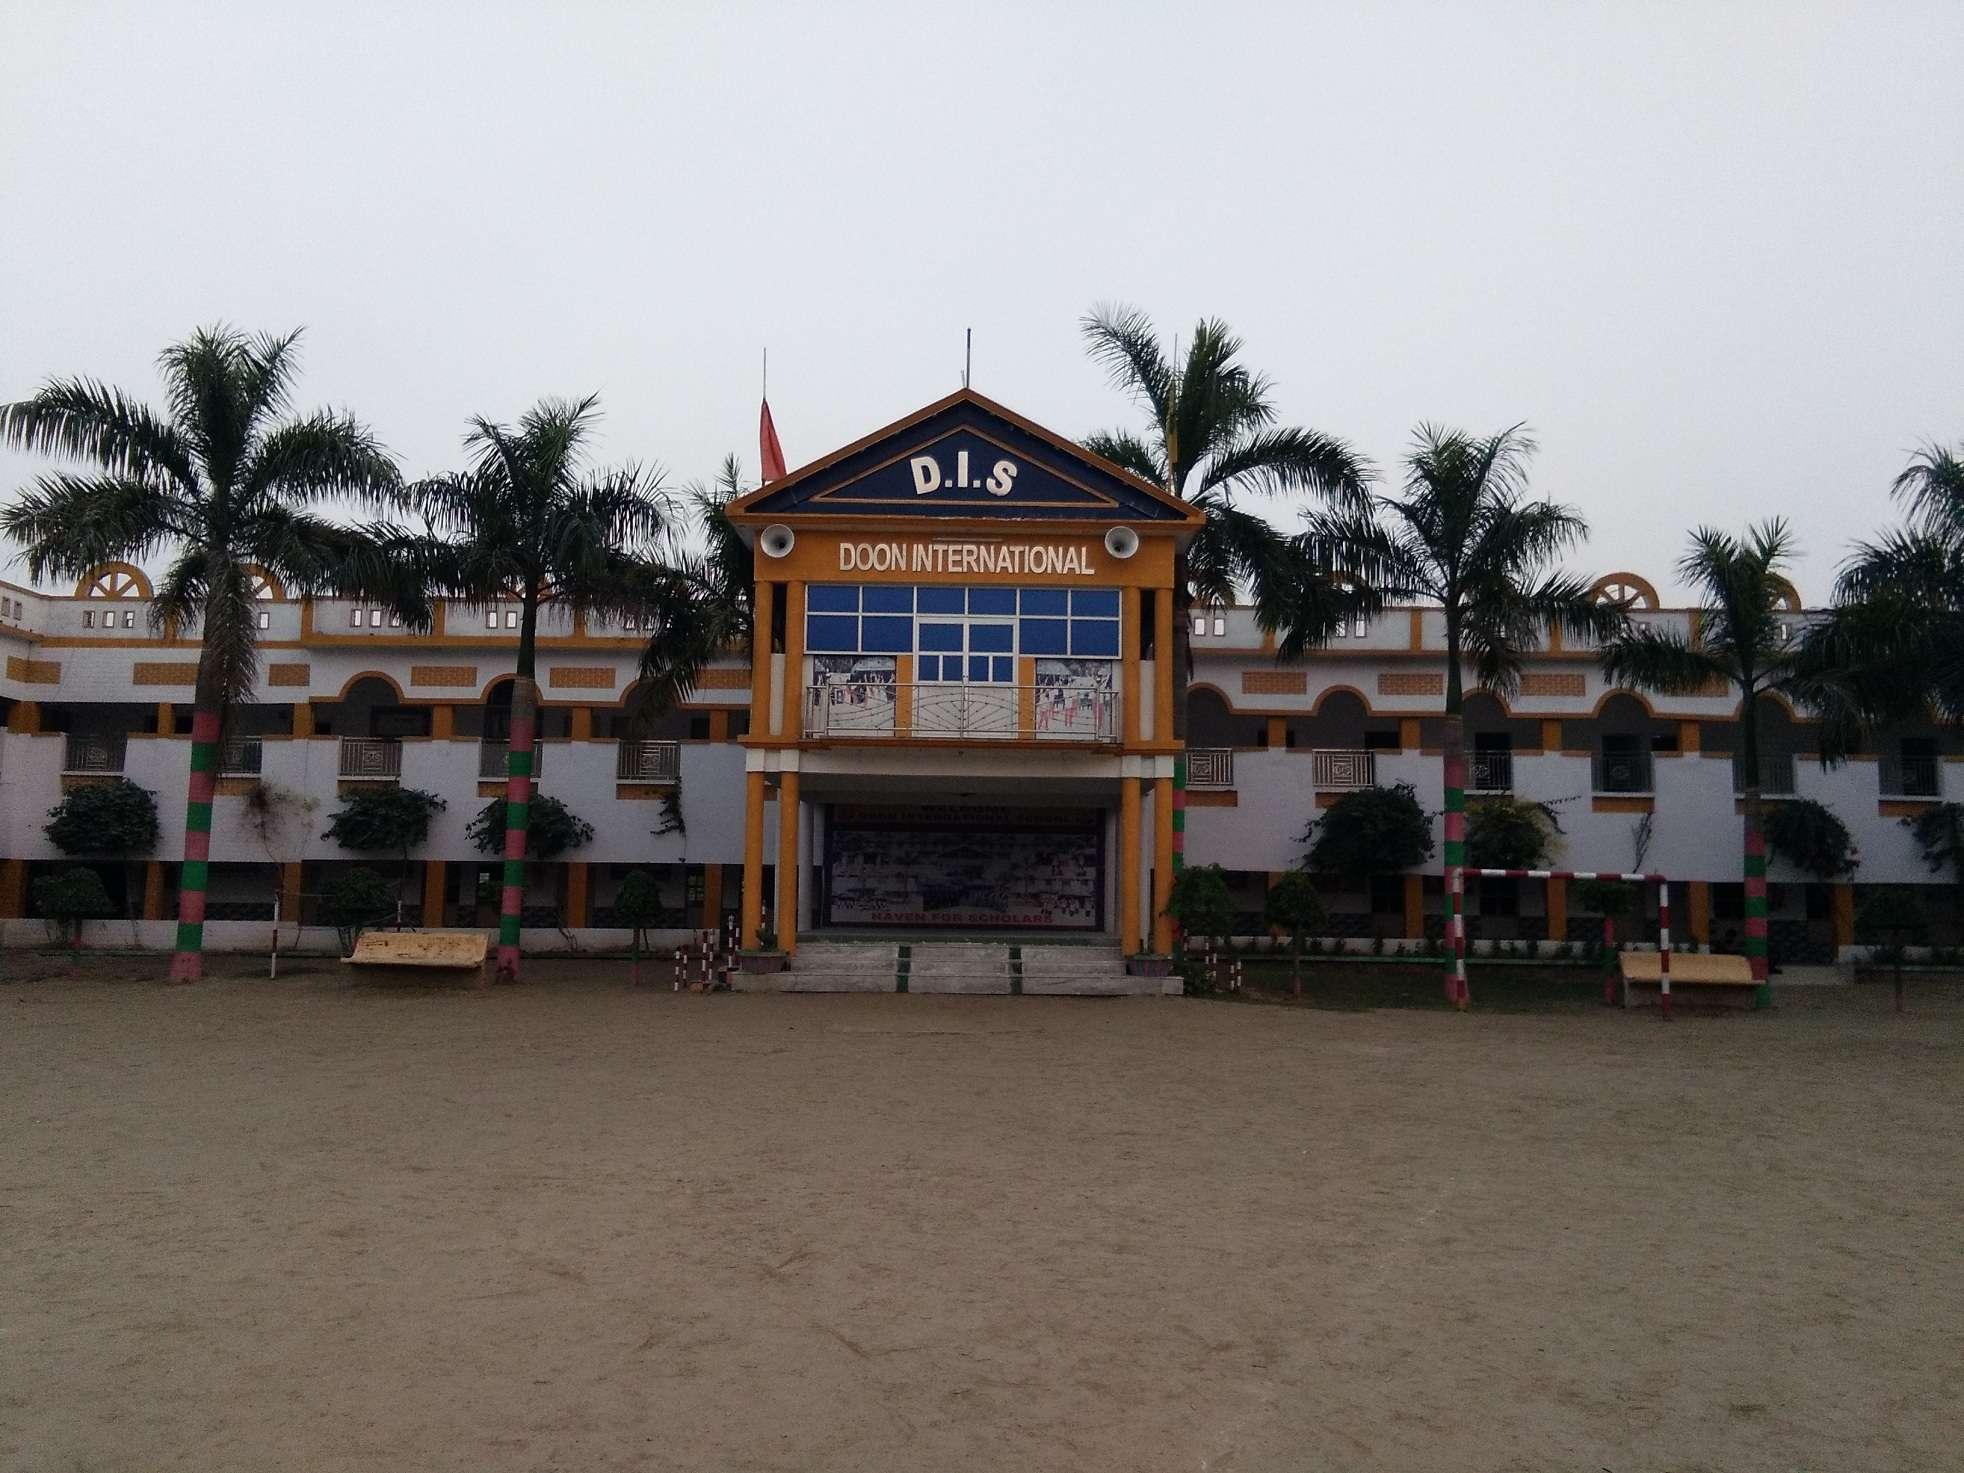 DOON INTERNATIONAL SCHOOL TEHRA PALIA KALAN DISTT LAKHIMPUR KHERI UTTAR PRADESH 2130235